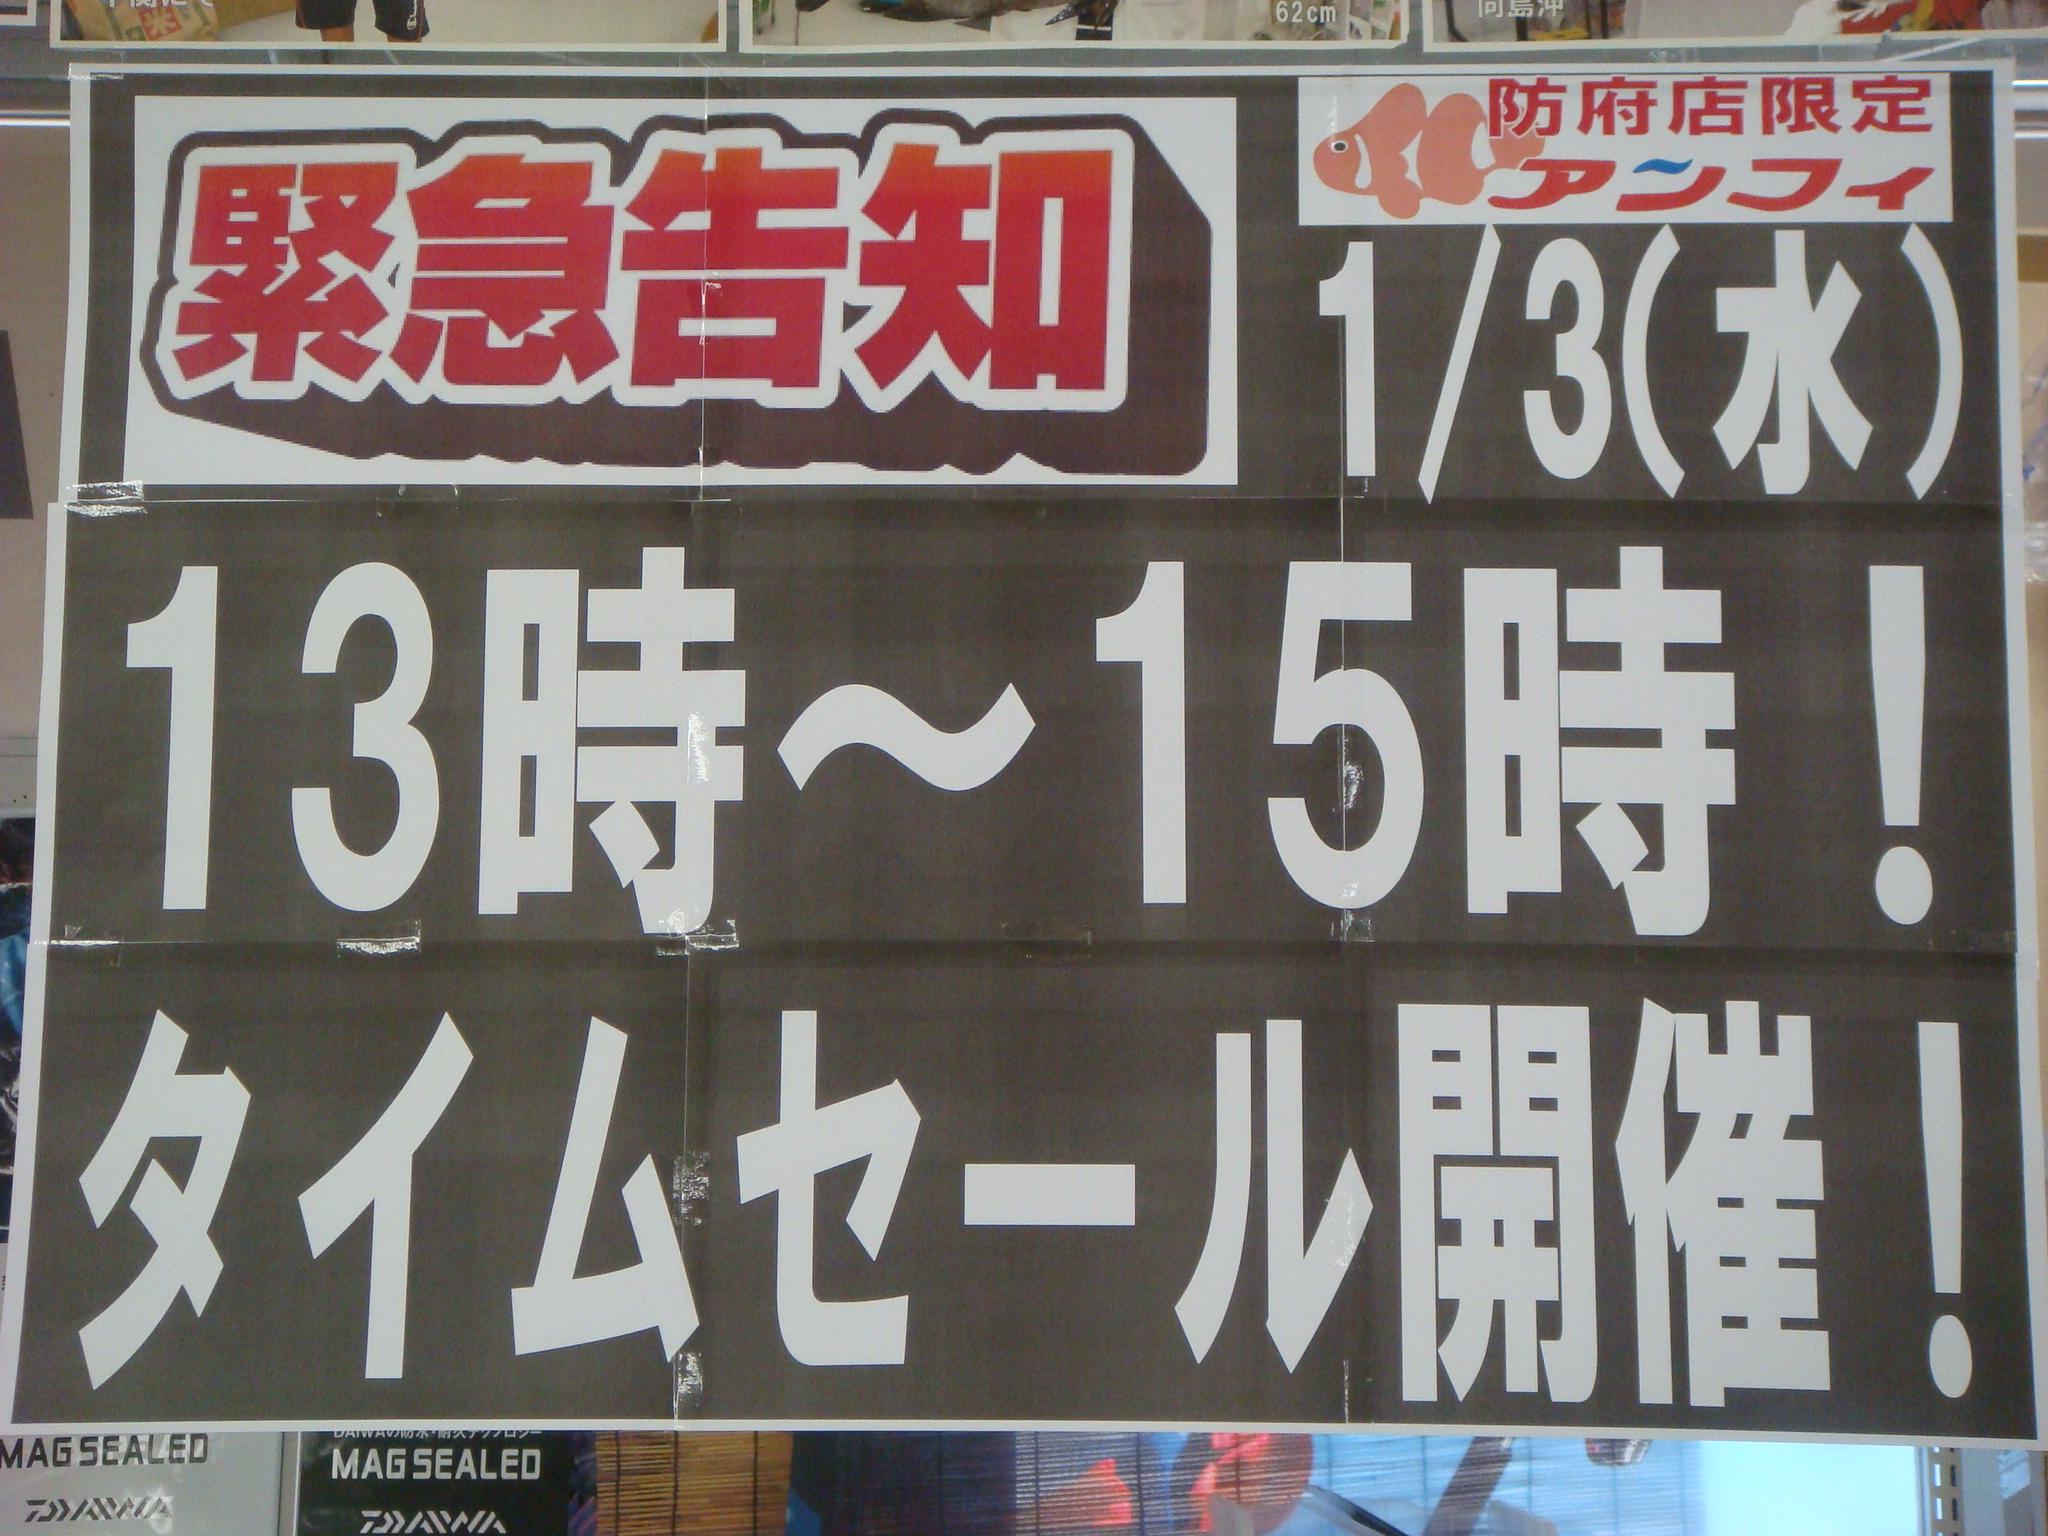 http://www.e-angle.co.jp/shop/news/DSC02667.JPG